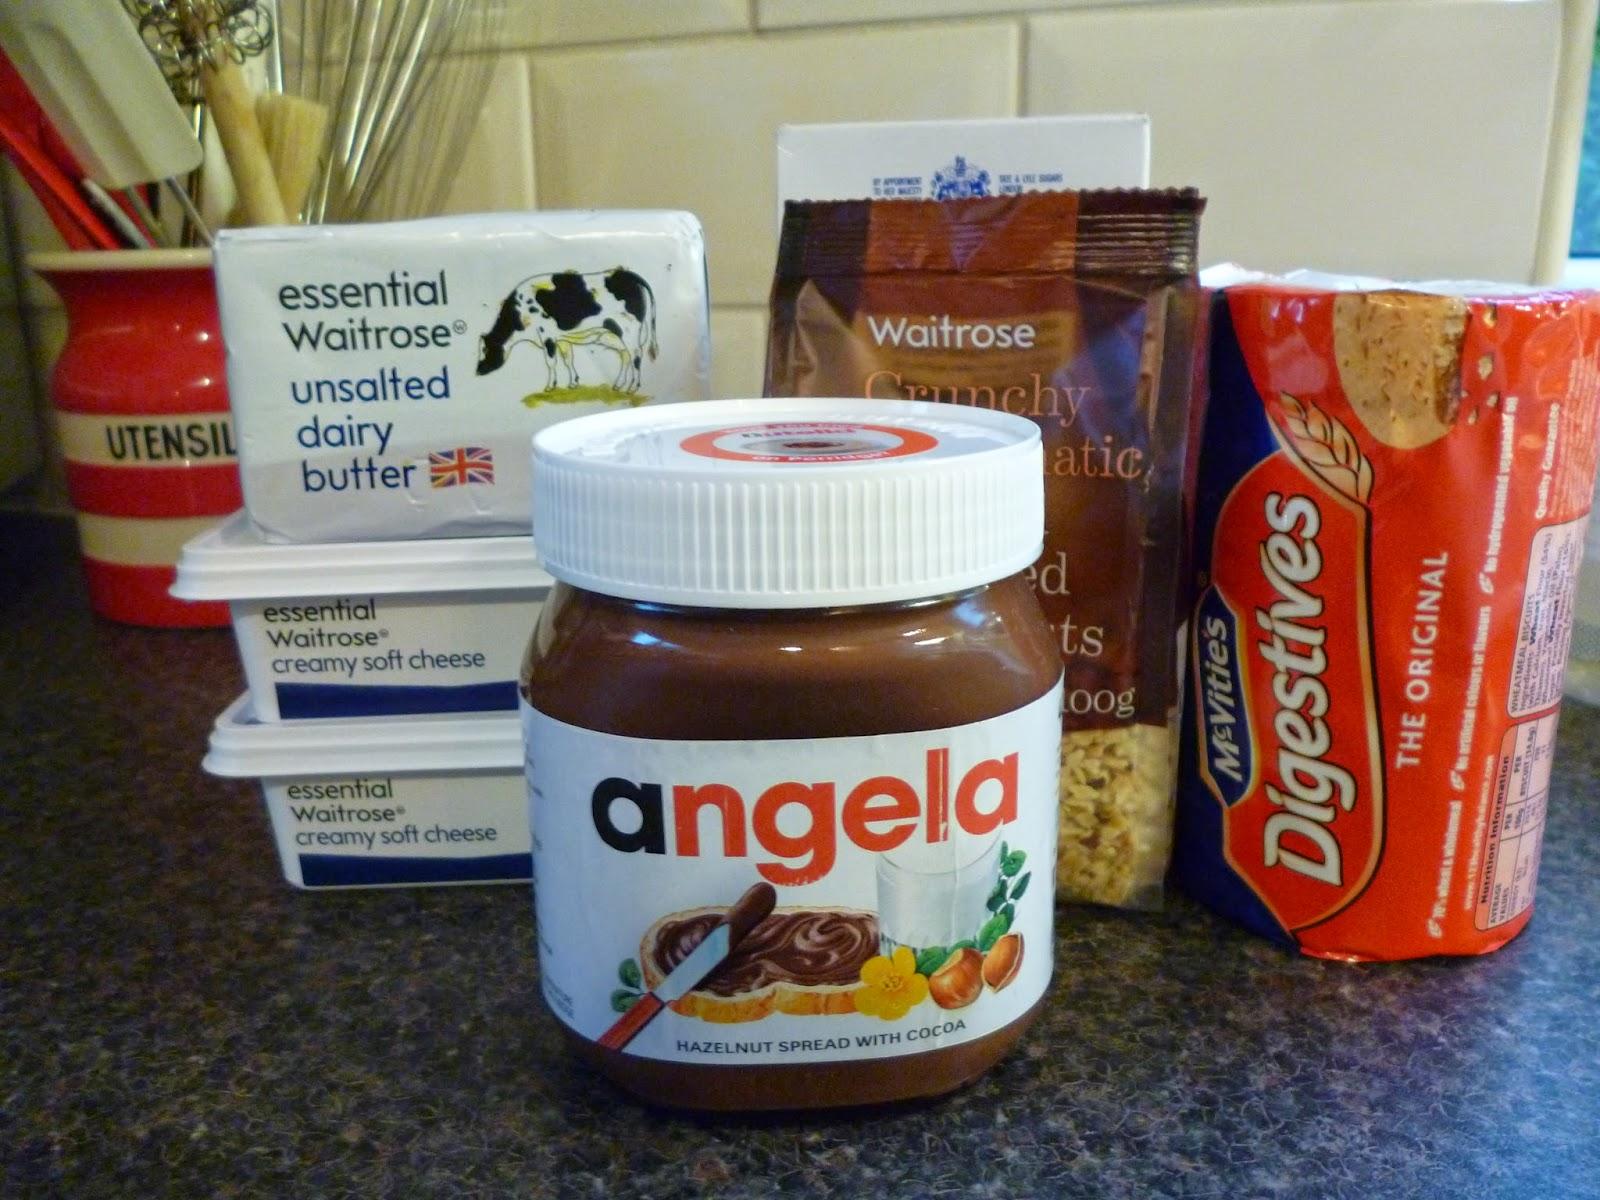 personalised jar of Nutella